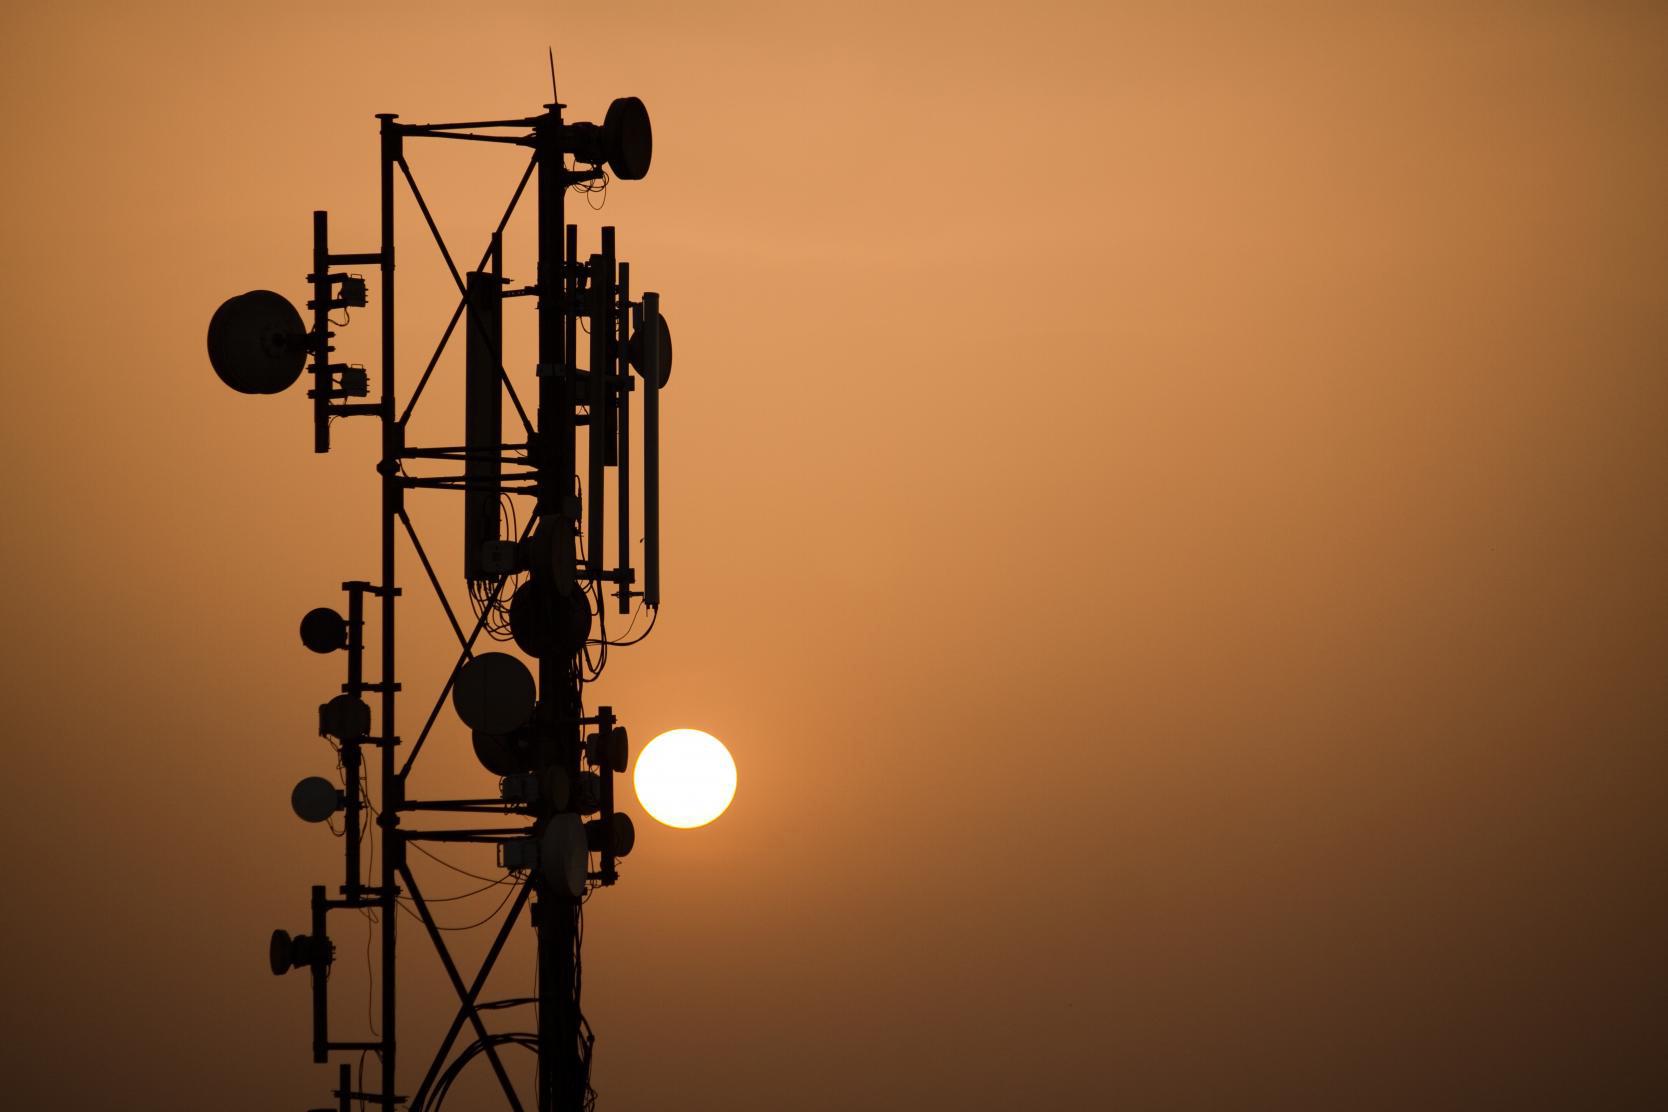 Telecom Infrastructure Design